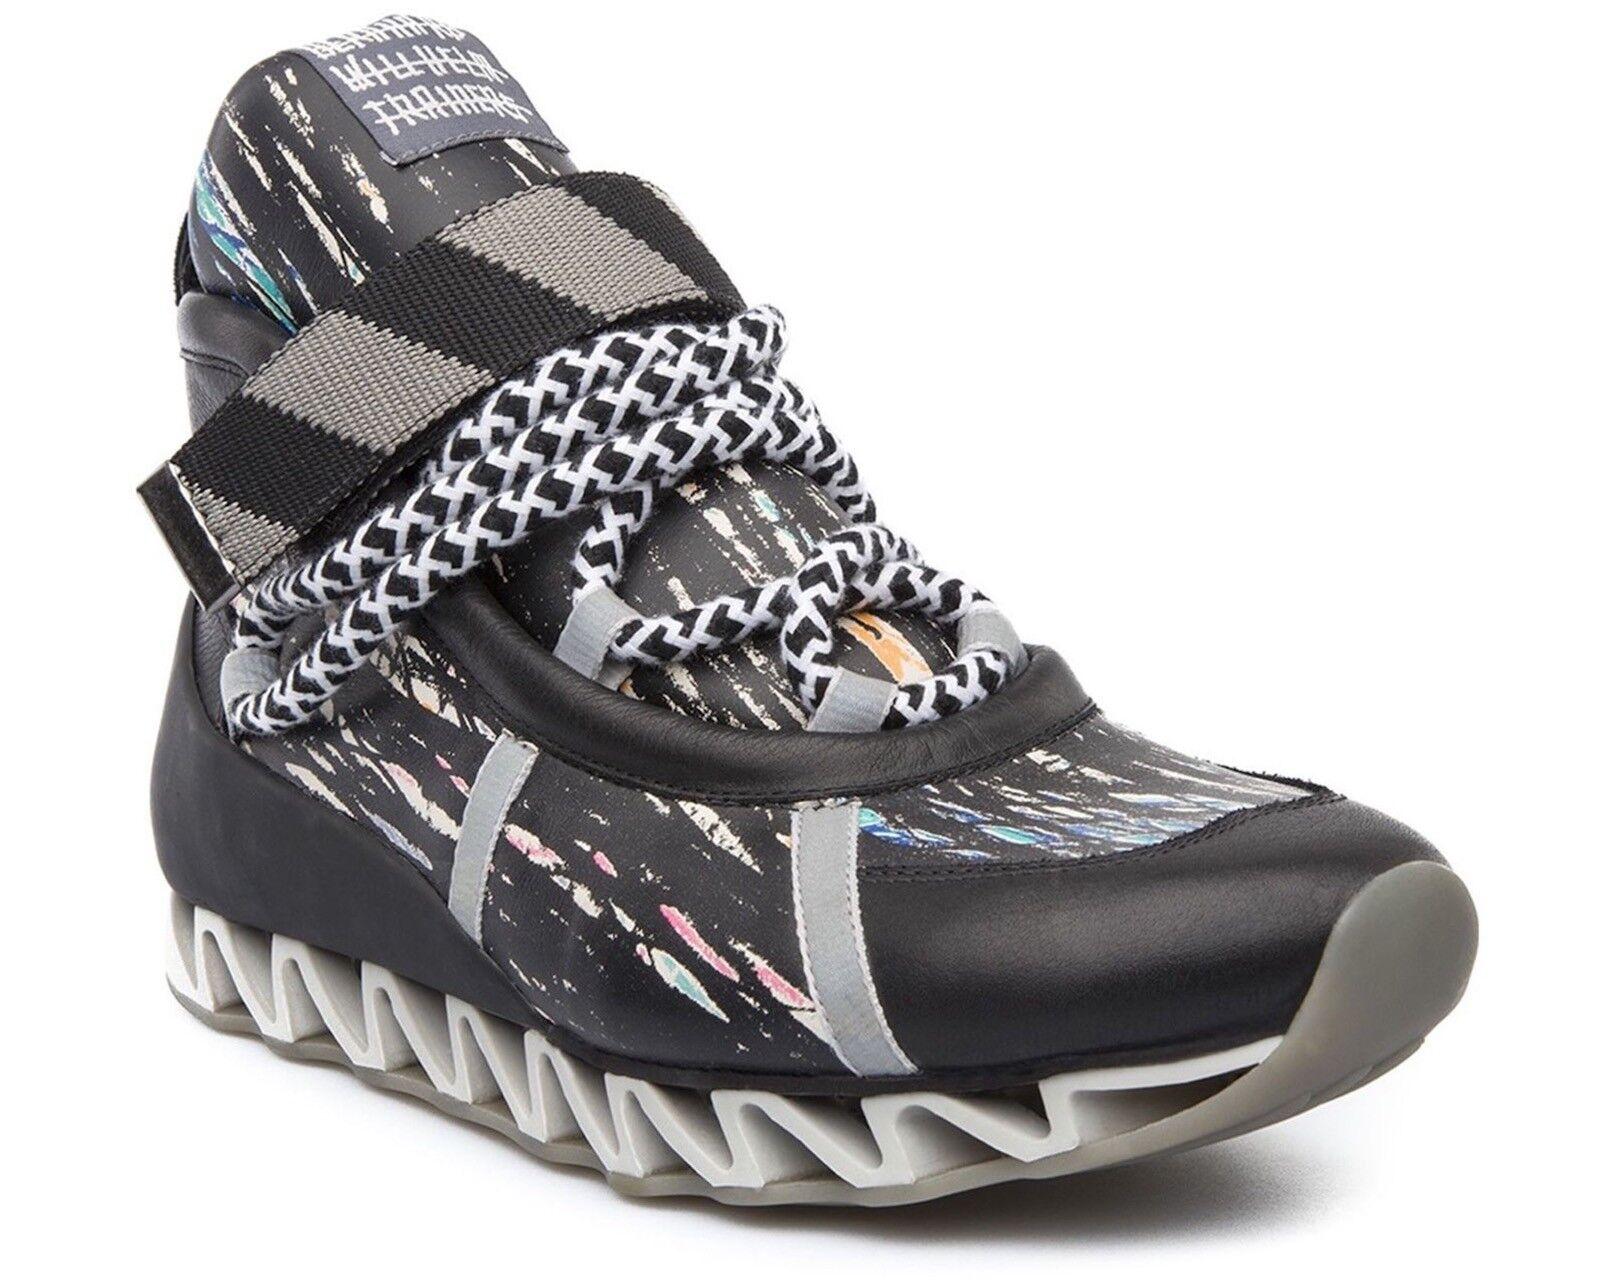 320 Bernhard Willhelm Camper US 10 EU 43 Together Himalayan Sneakers 36514-018